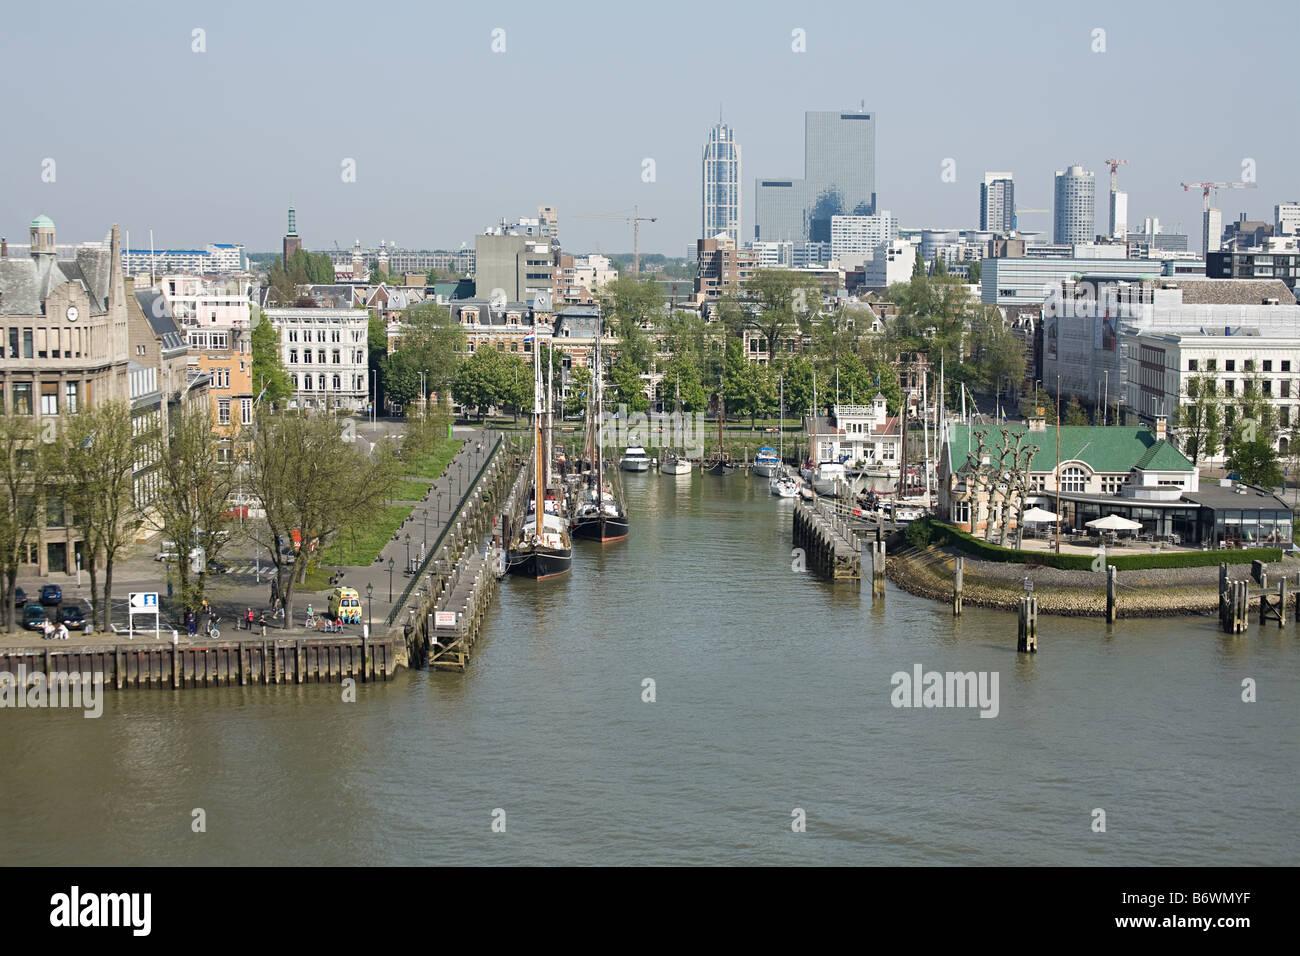 Rotterdam Imagen De Stock